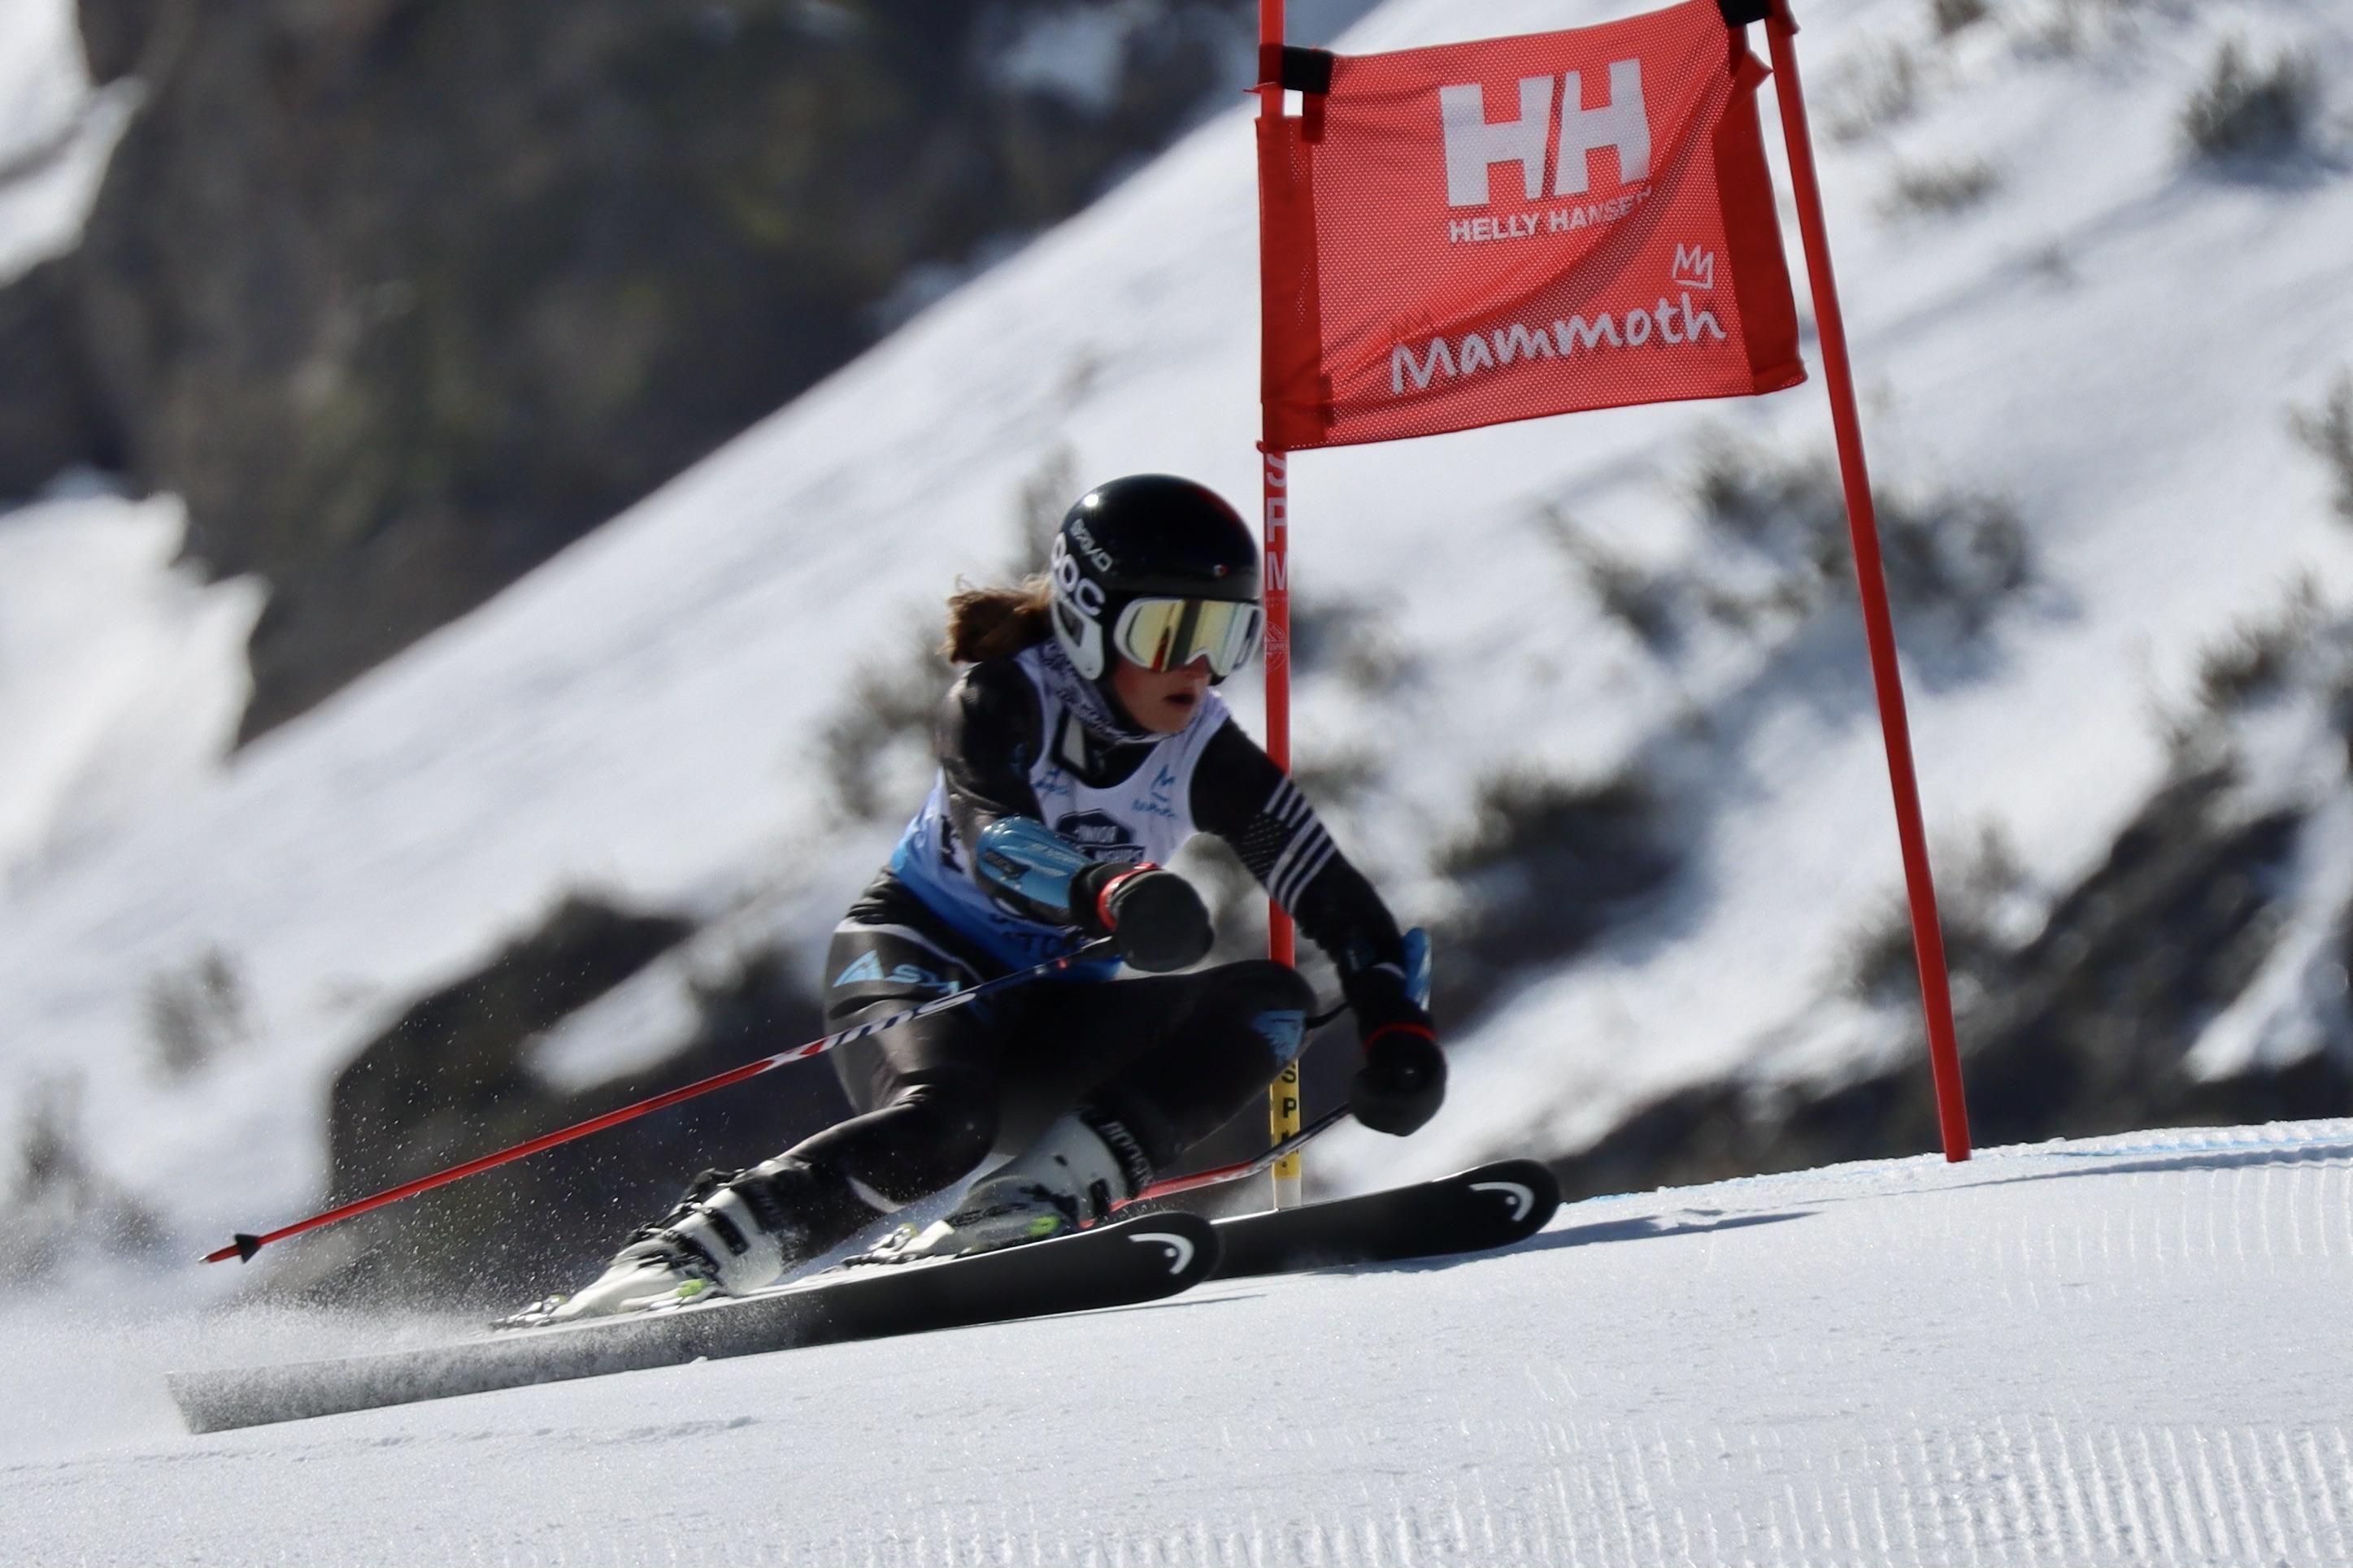 Brenna Ritchie - u16 Regional Champs GS at Mammoth